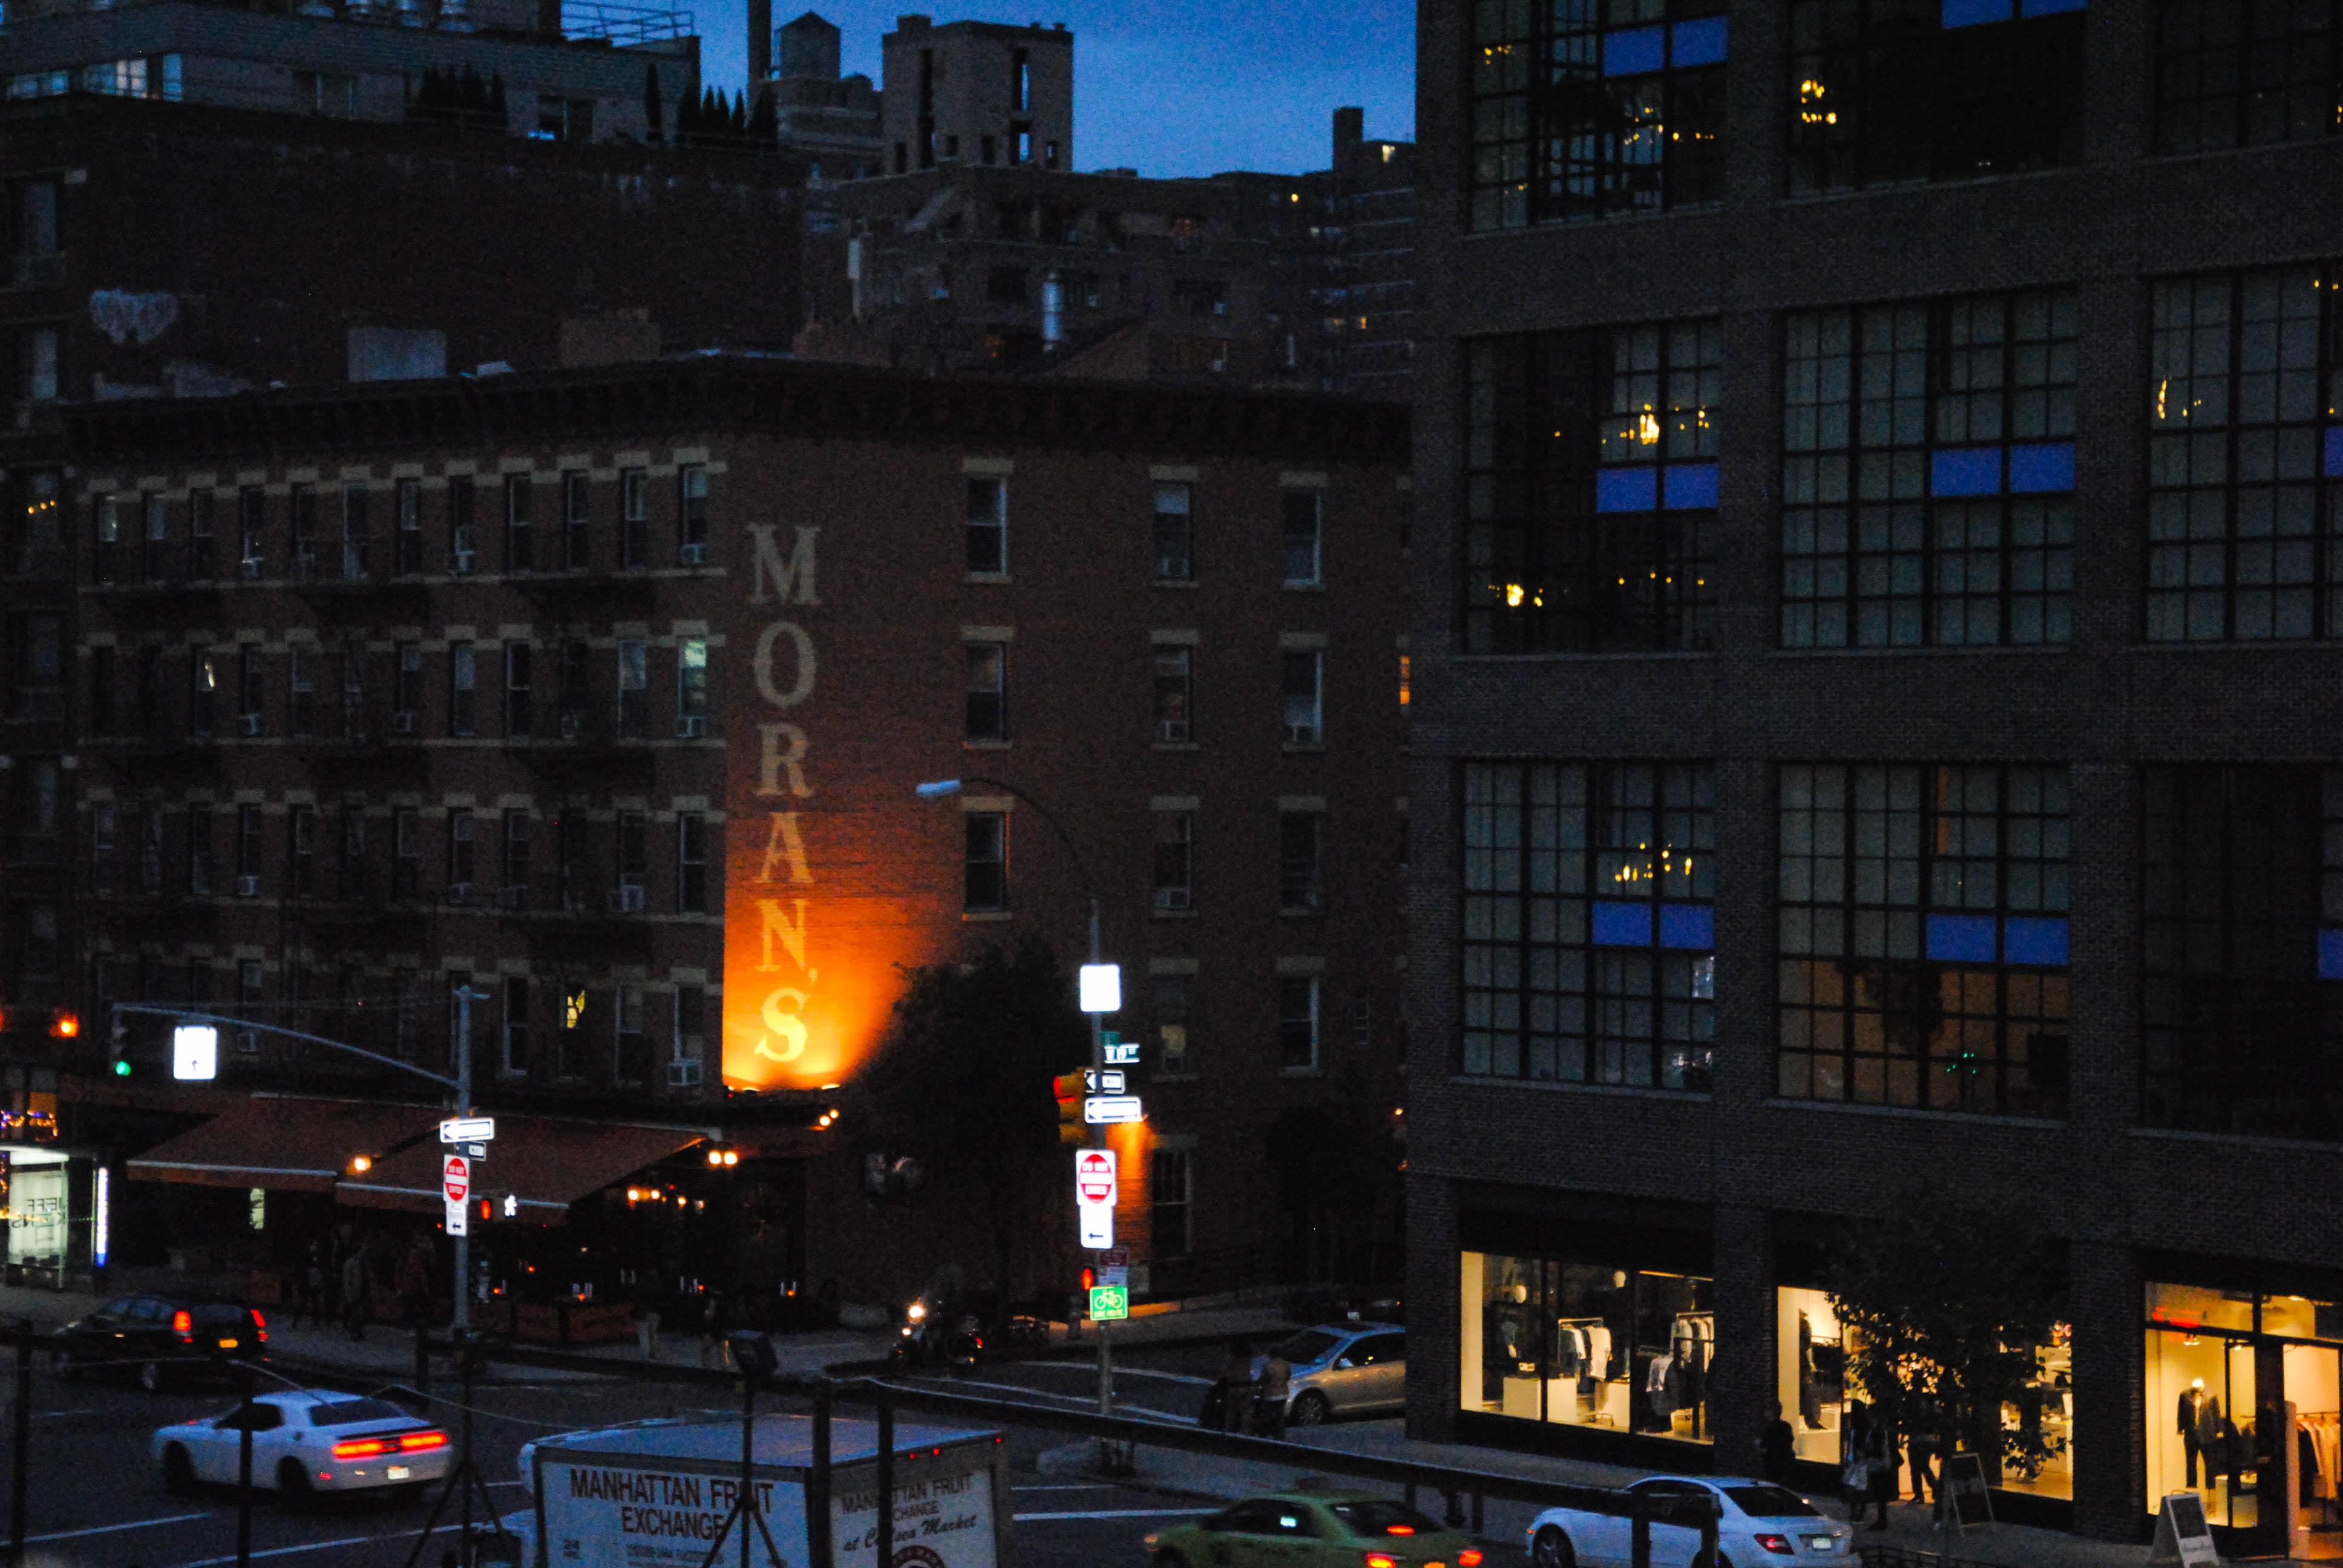 wallpaper city street cityscape night reflection park road